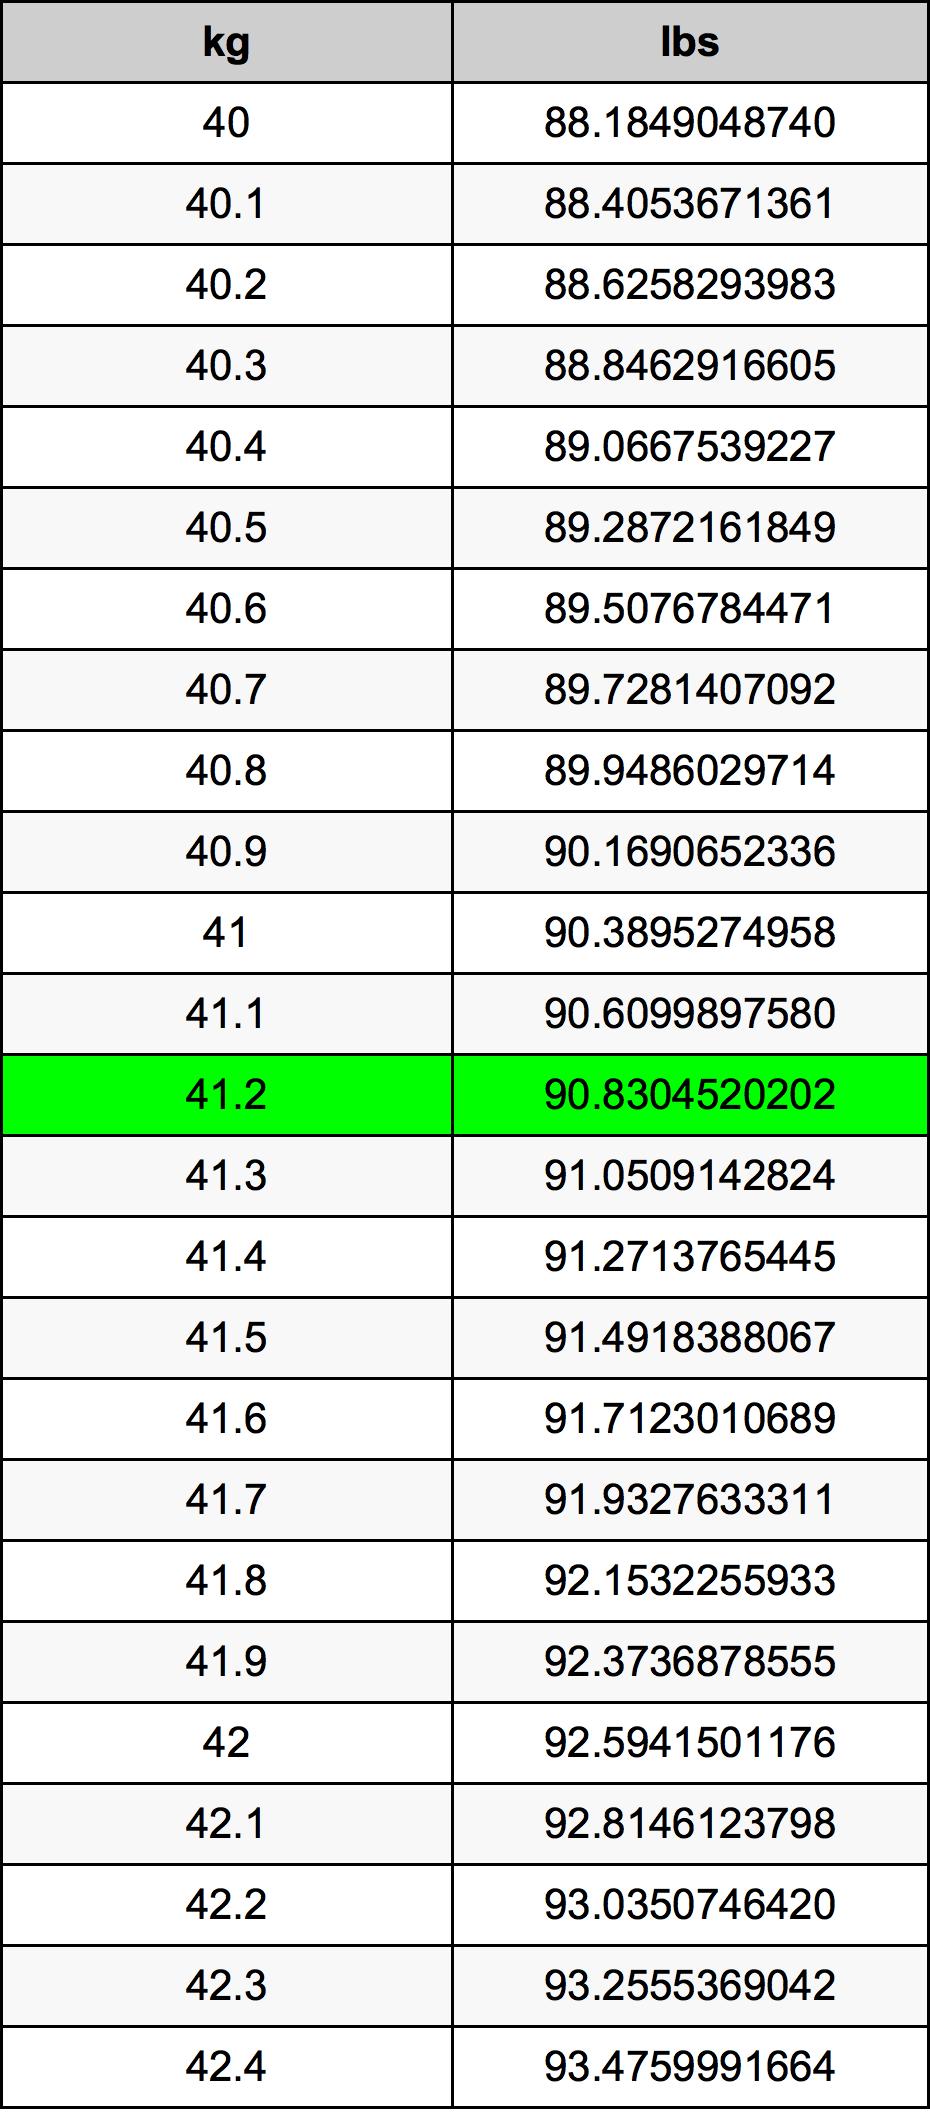 41.2 Kilogram konverteringstabellen